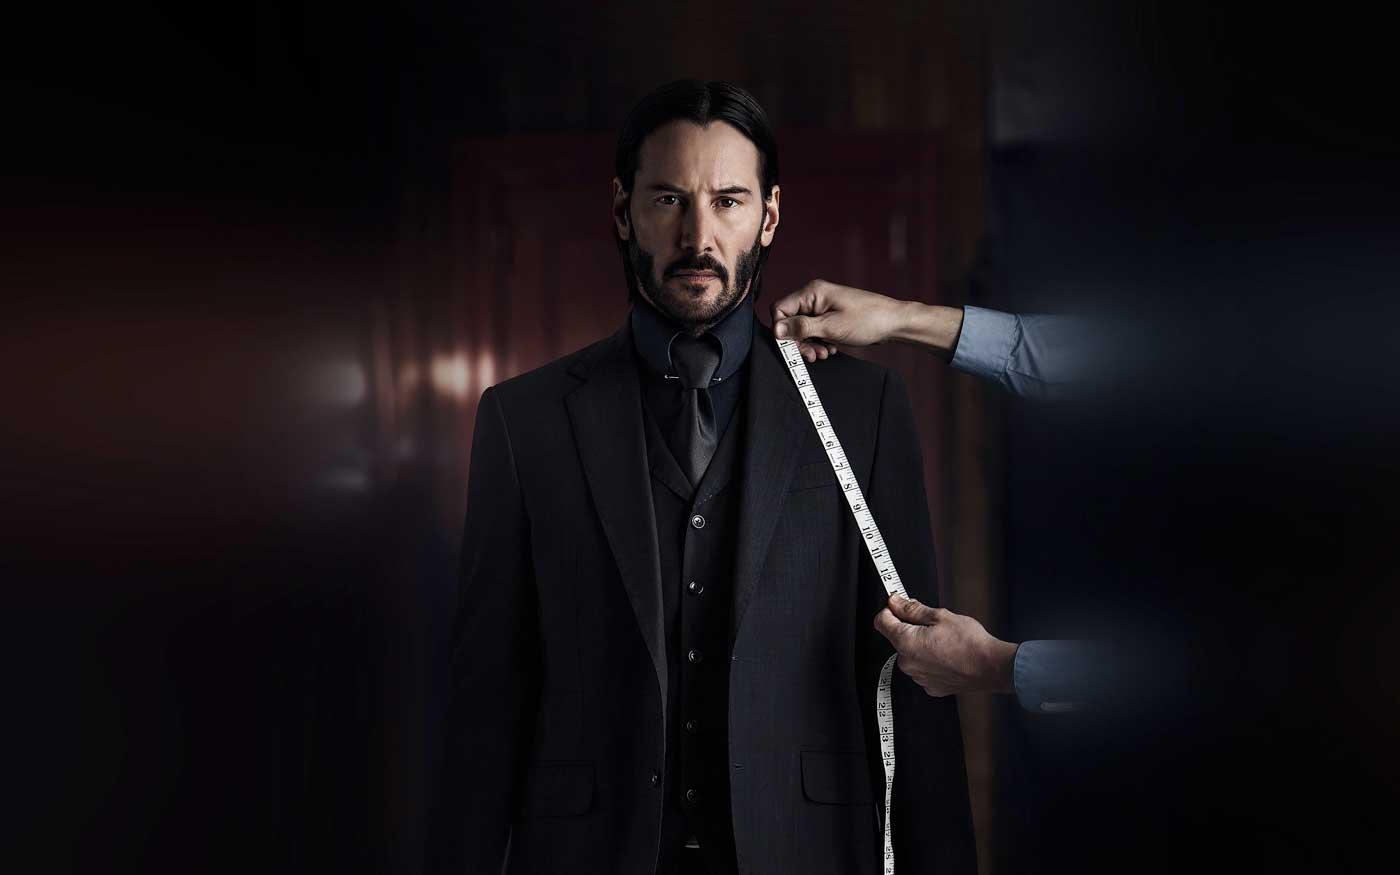 Jon wick suit tailoring